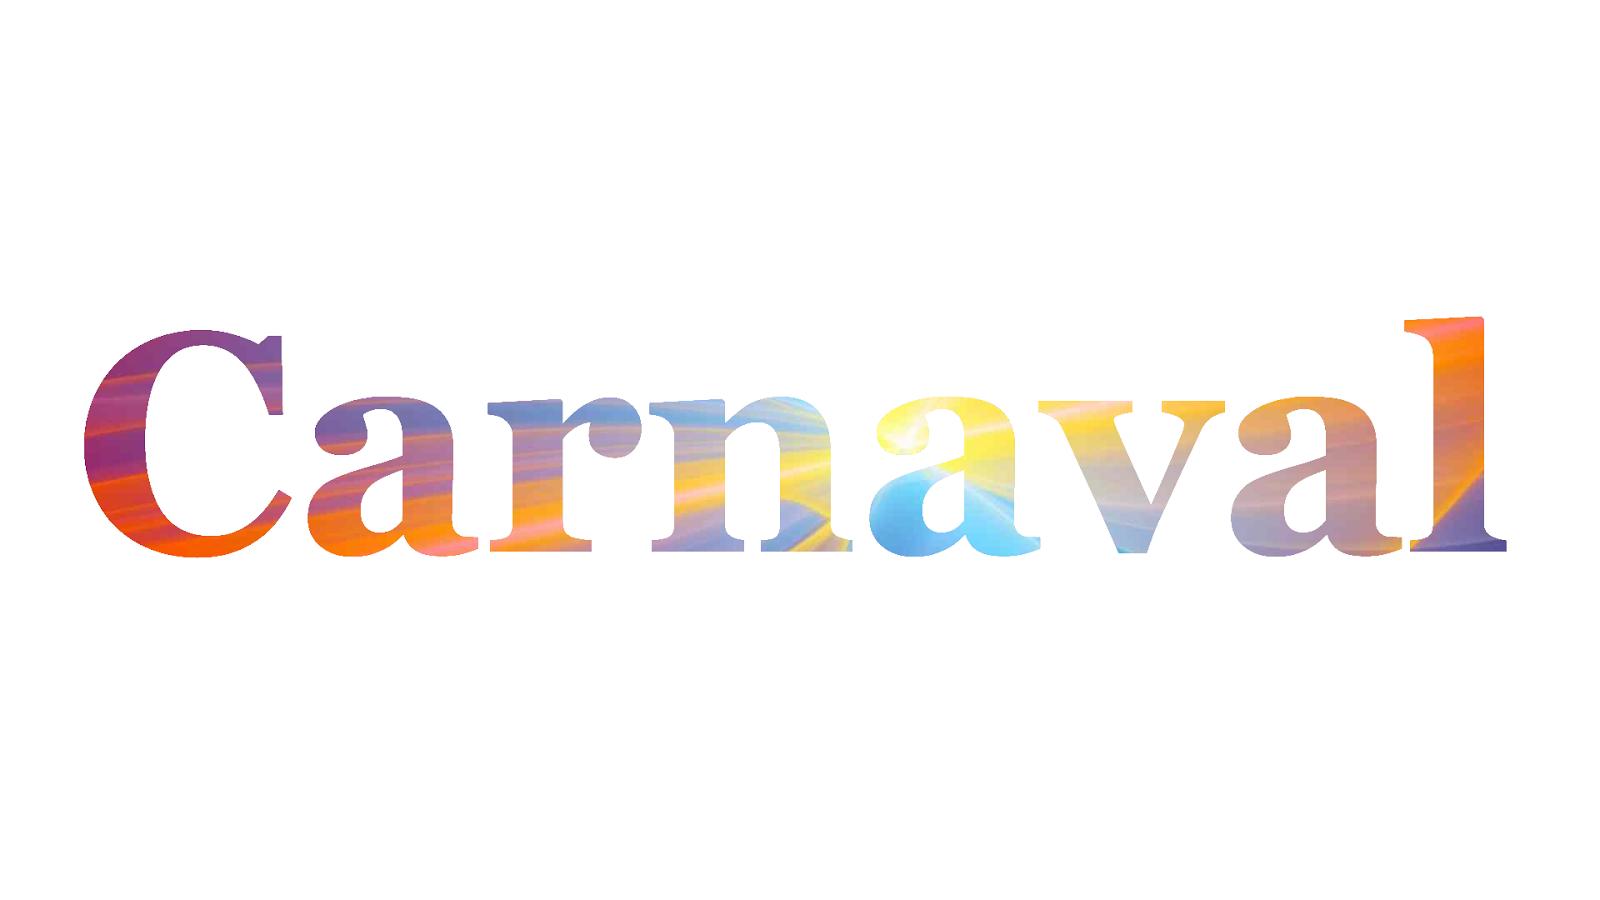 Nome Carnaval 3_fundo branco 1920 x 1080